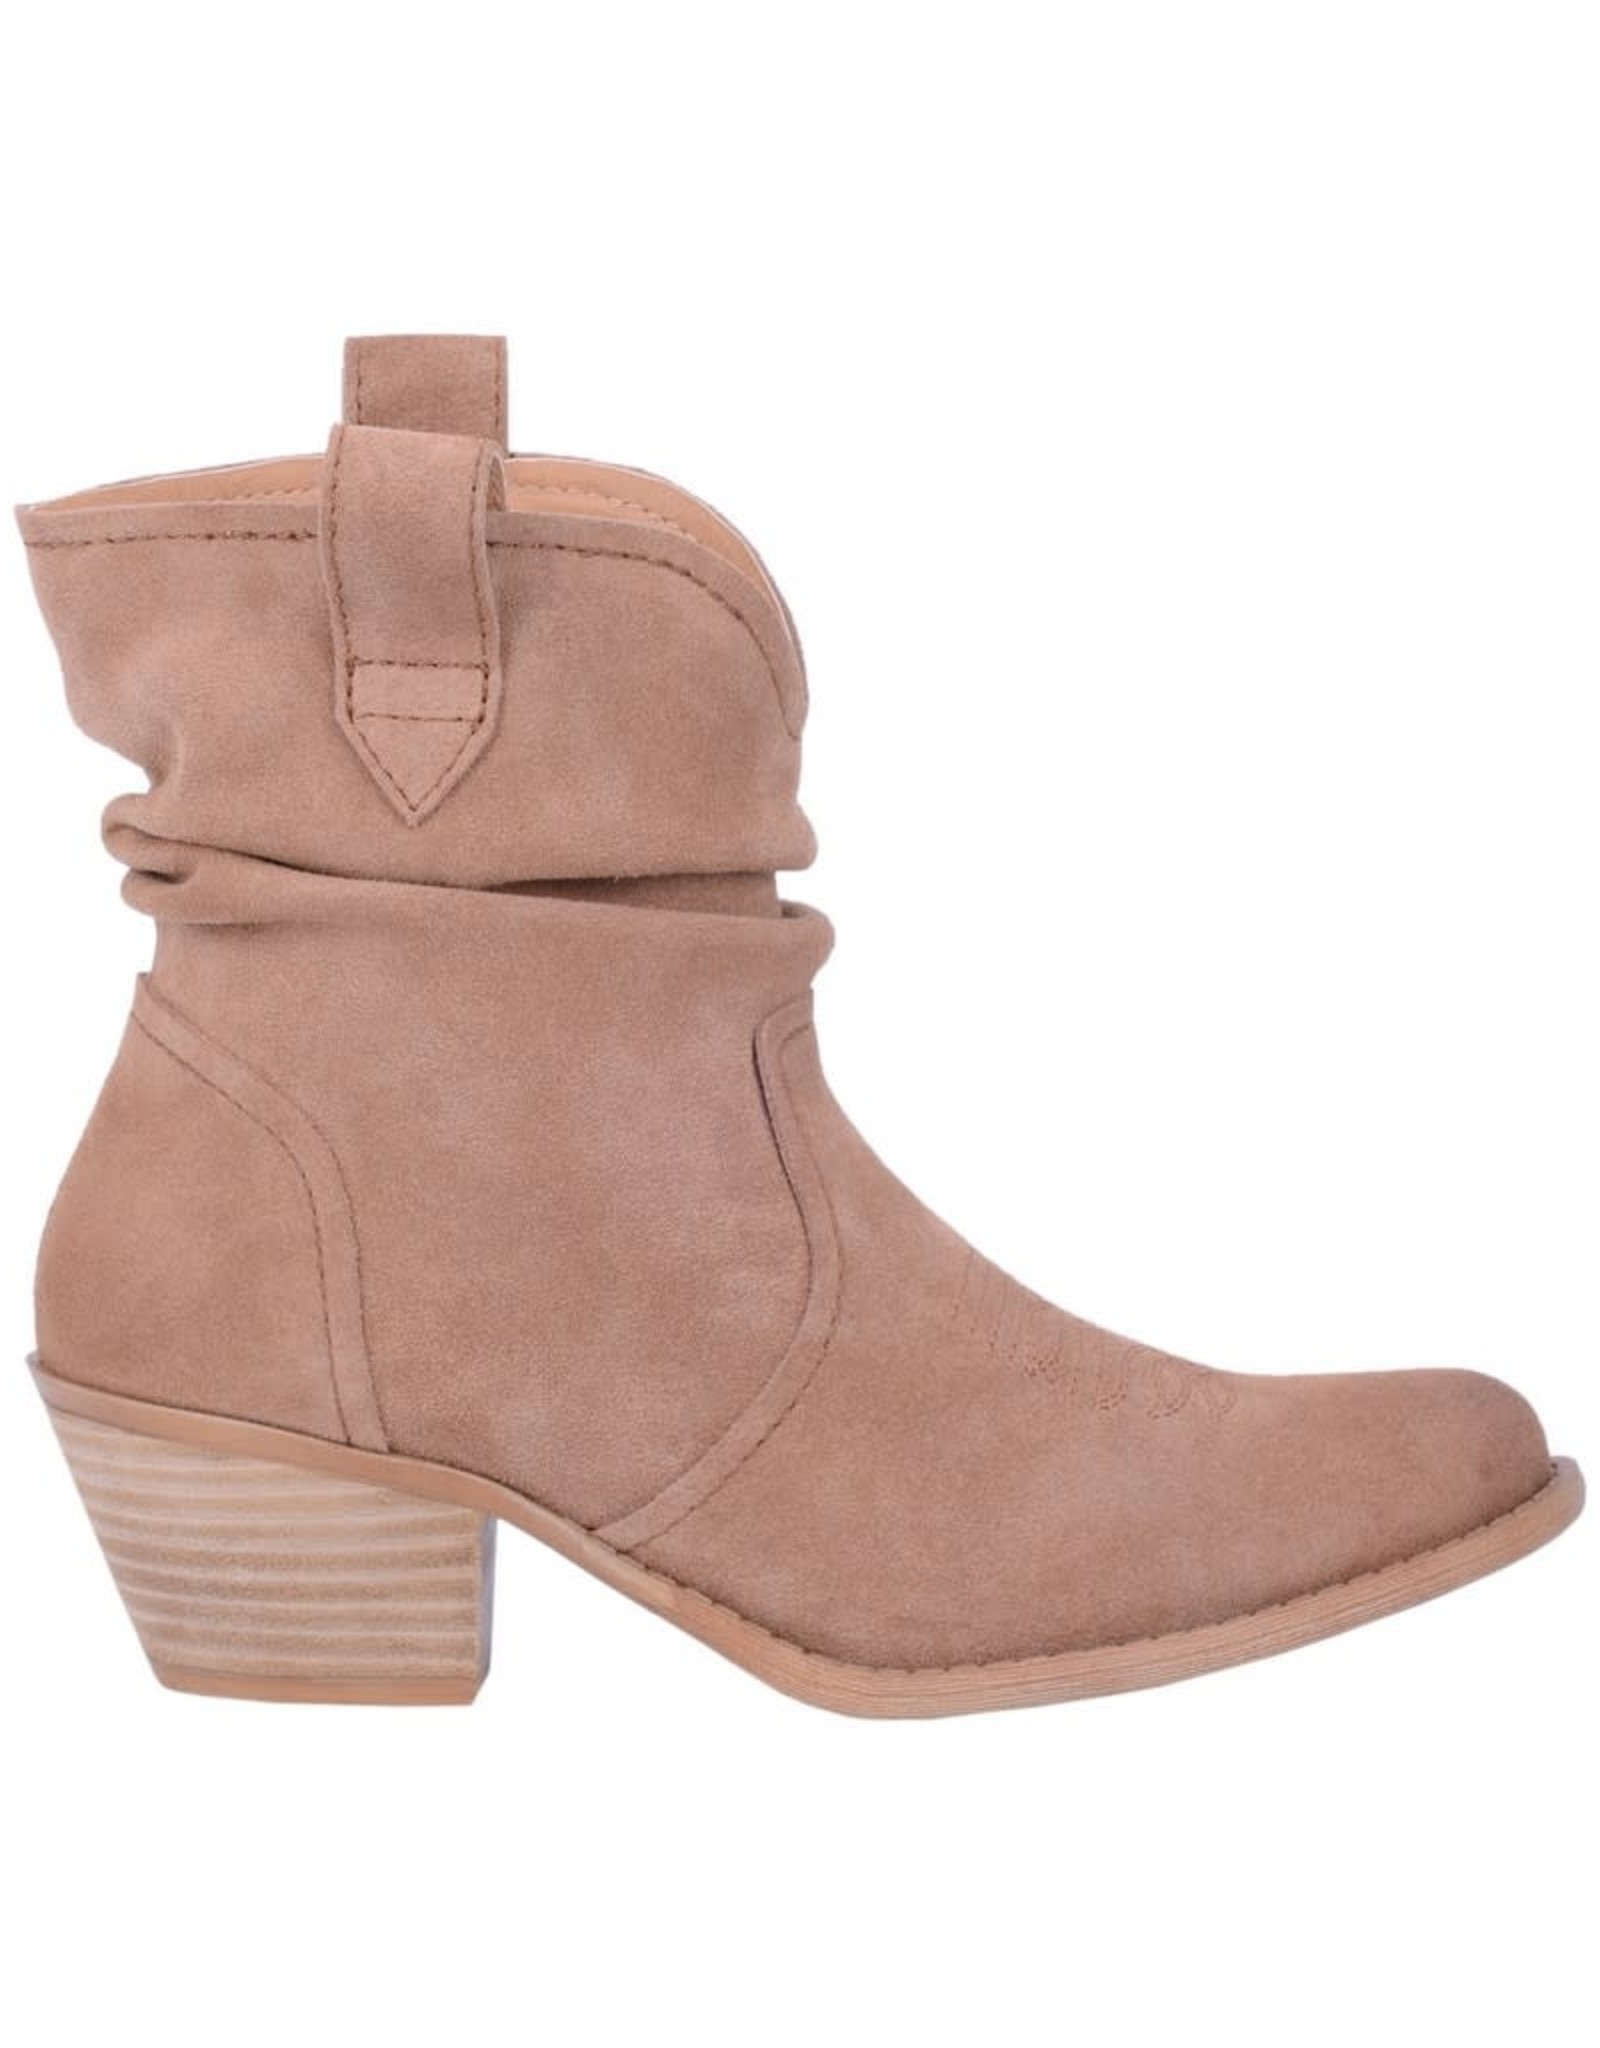 Dingo Jackpot Boots- Dark Tan